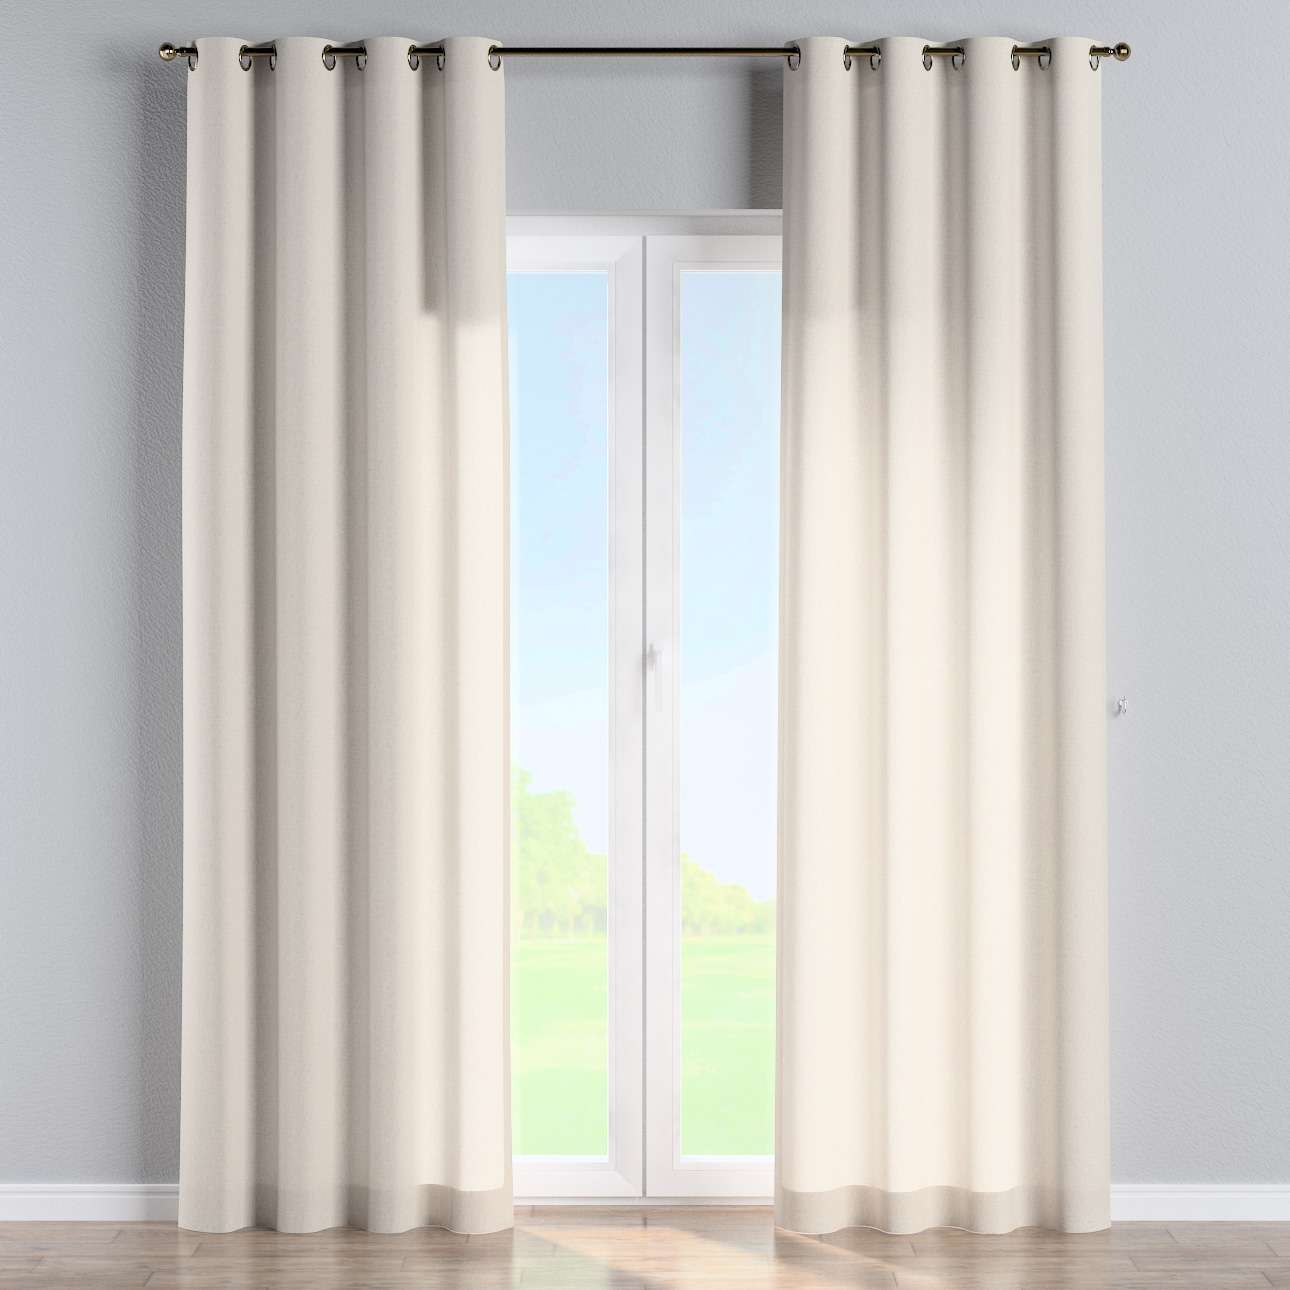 Záves s kolieskami 130 x 260 cm V kolekcii Loneta, tkanina: 133-65